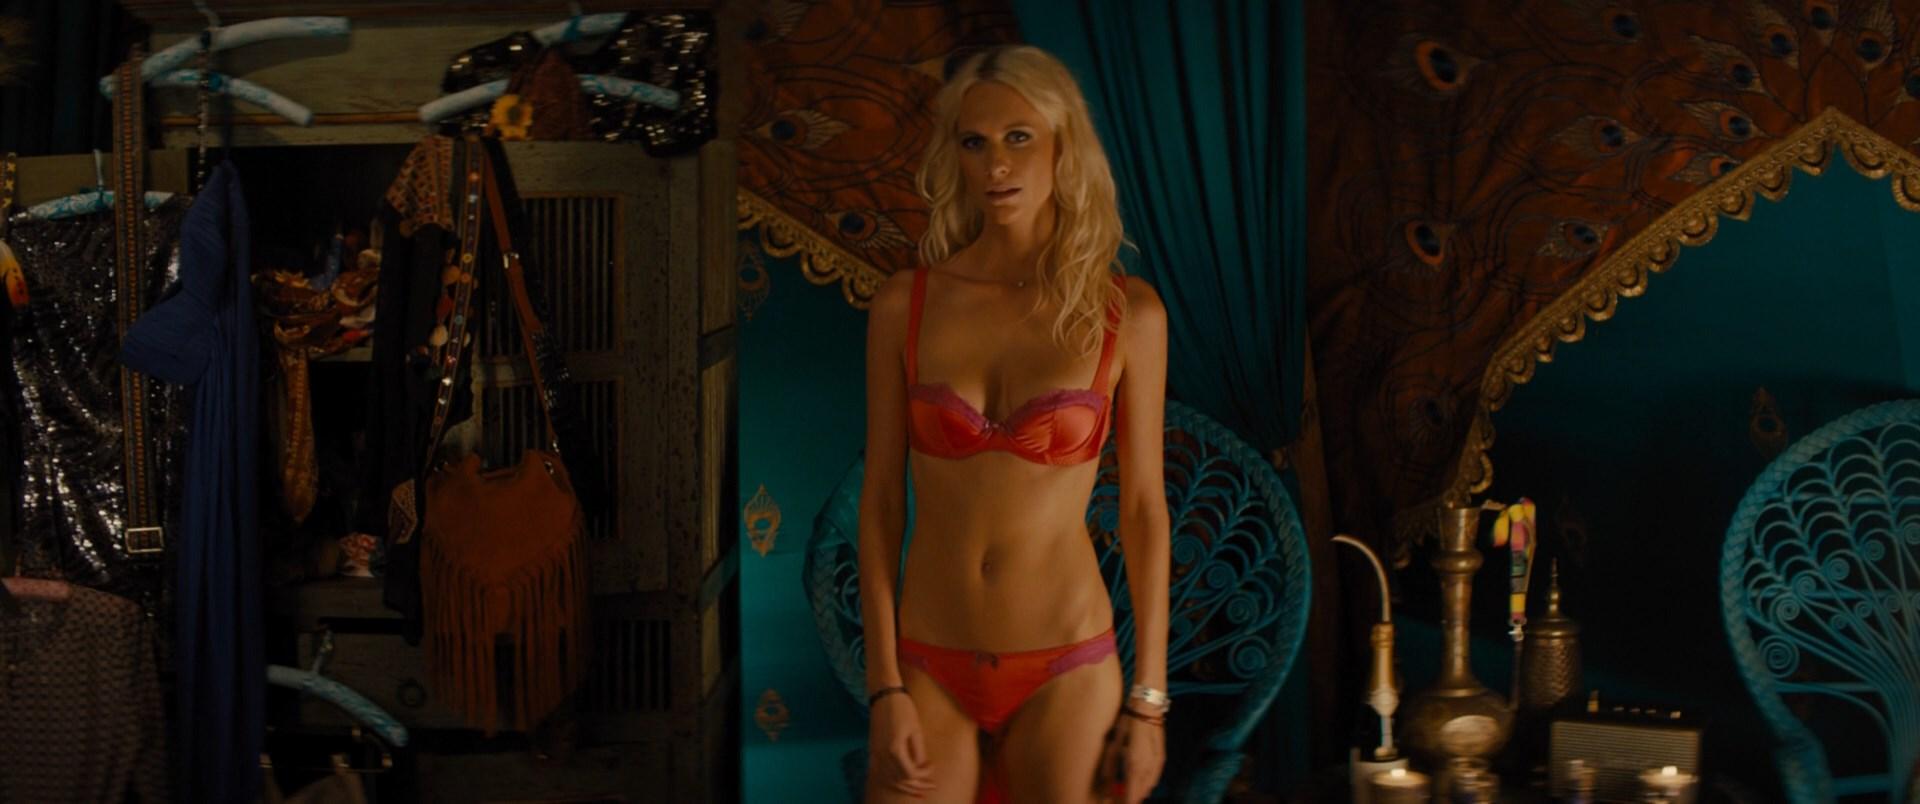 Alana cruise lesbian - Porn very hot image free site.